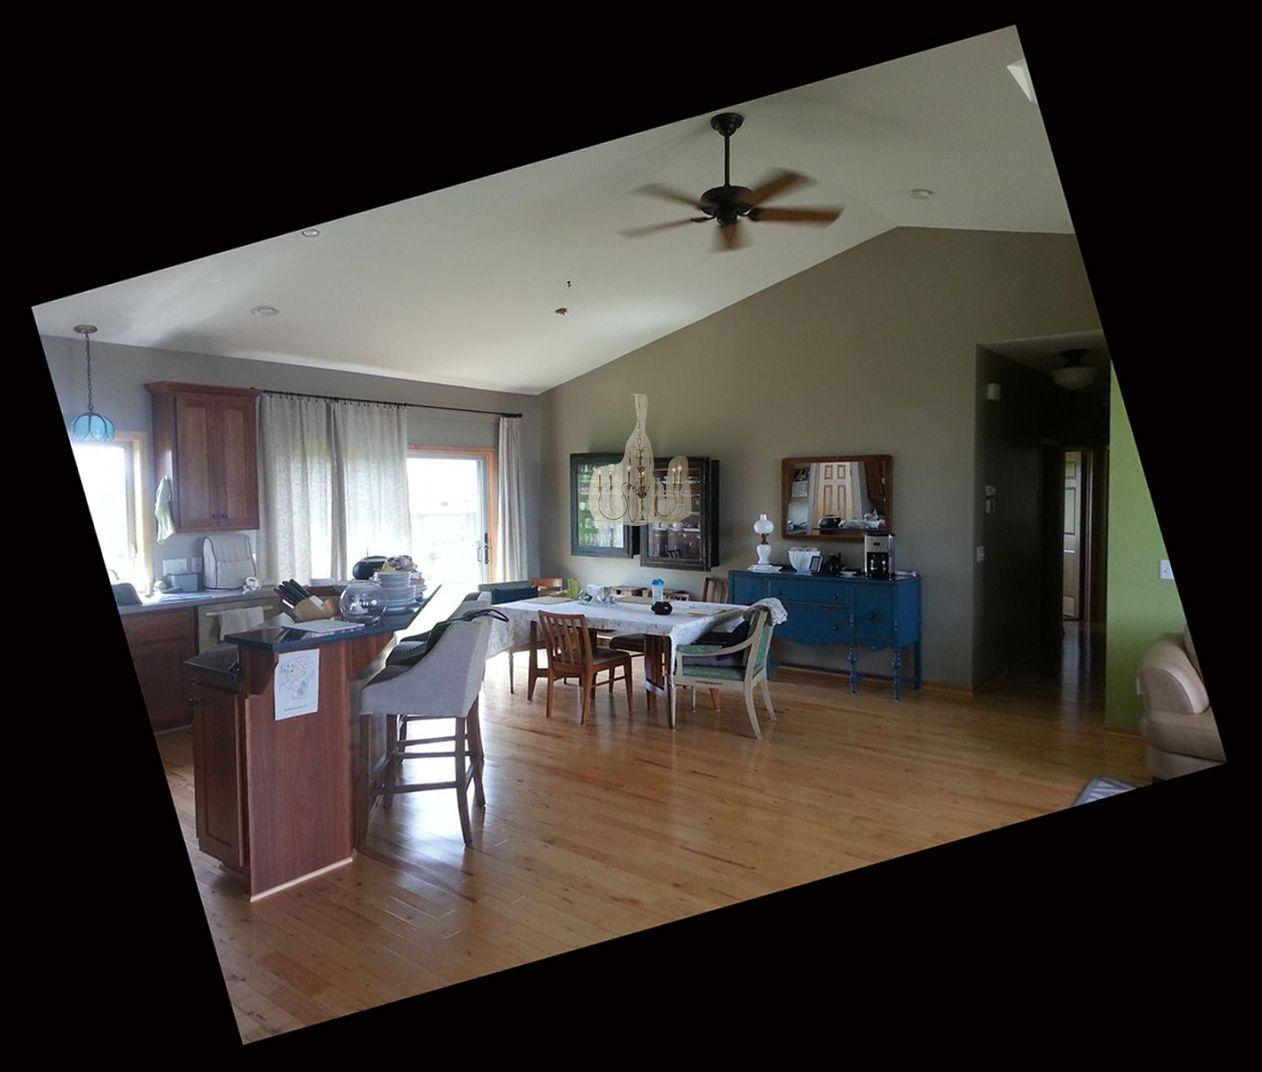 "Chandelier idea for my dining room. Horchow Salento Six-Light Chandelier 32"" diameter."